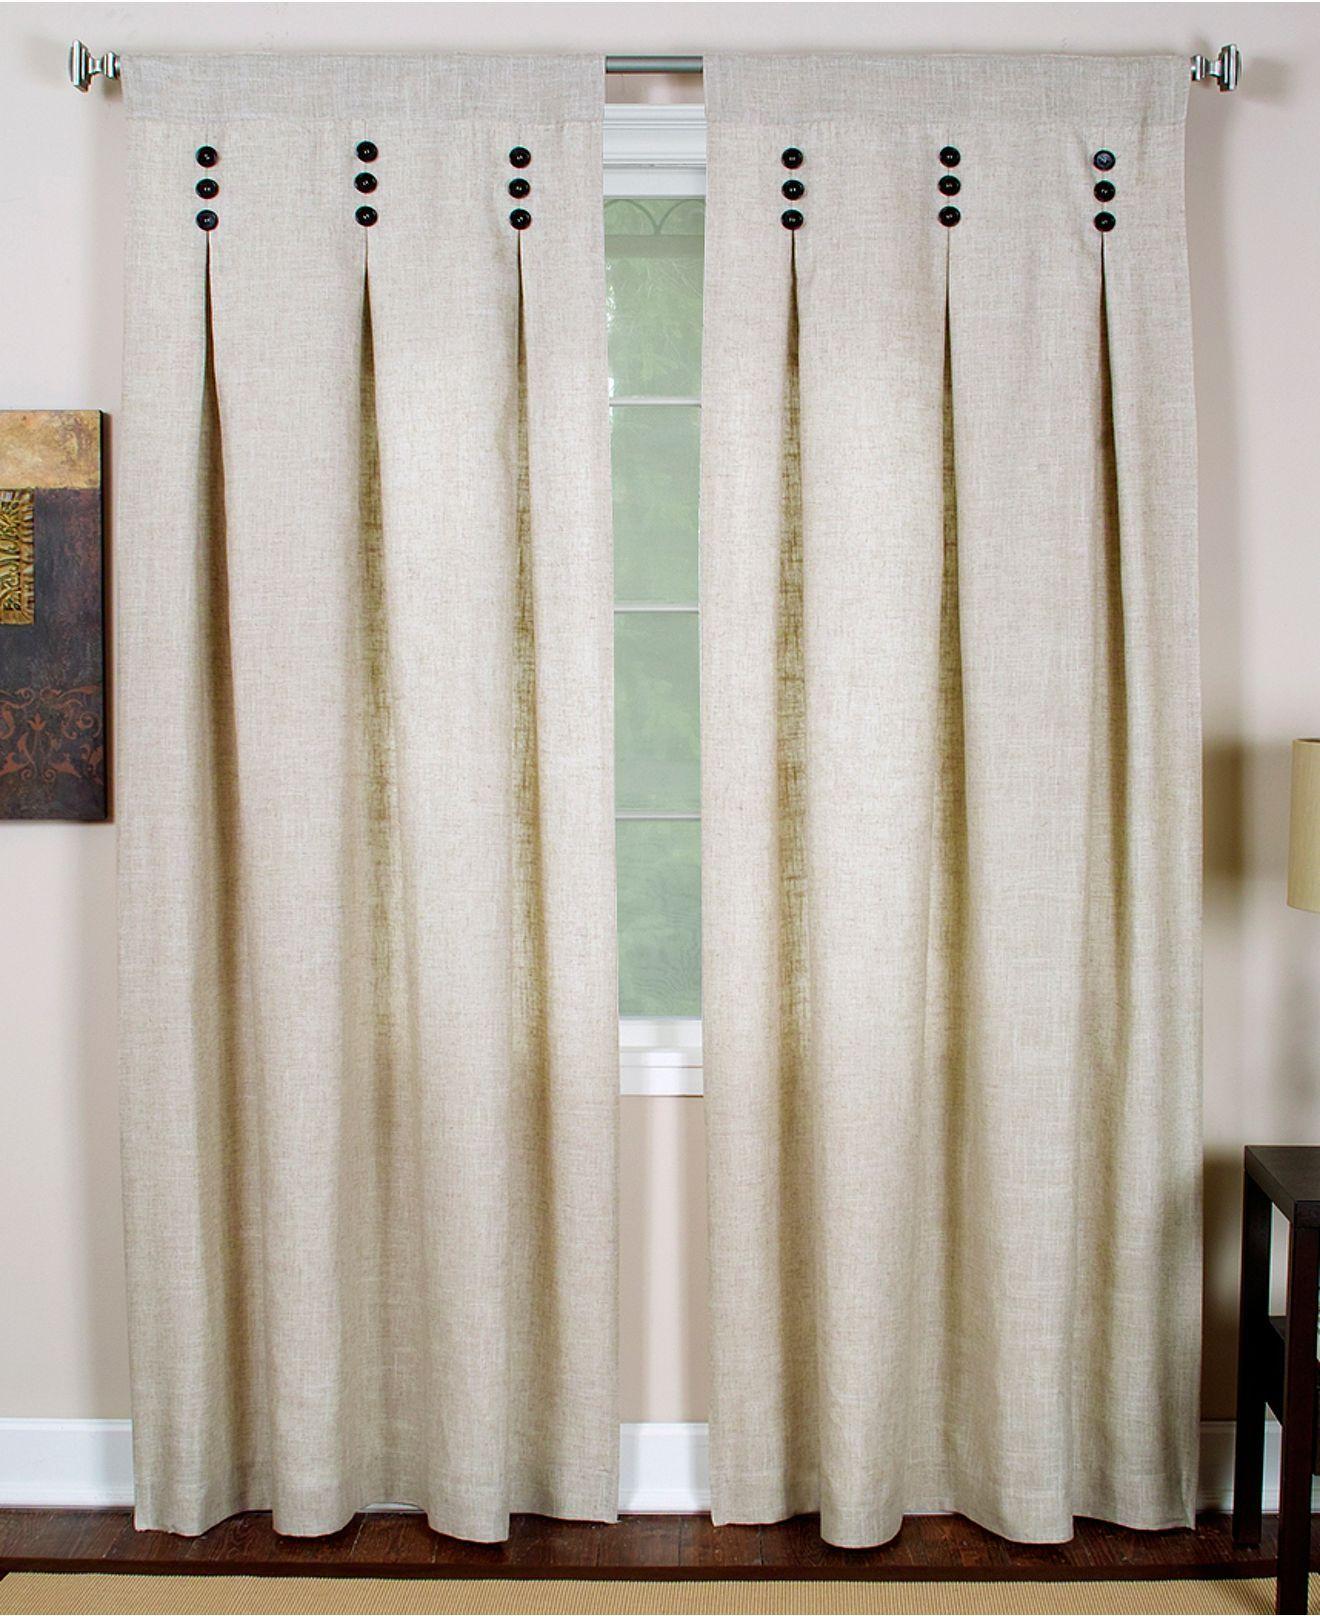 Erlene Window Treatments Murano 26 Quot By 84 Quot Panel Macy S